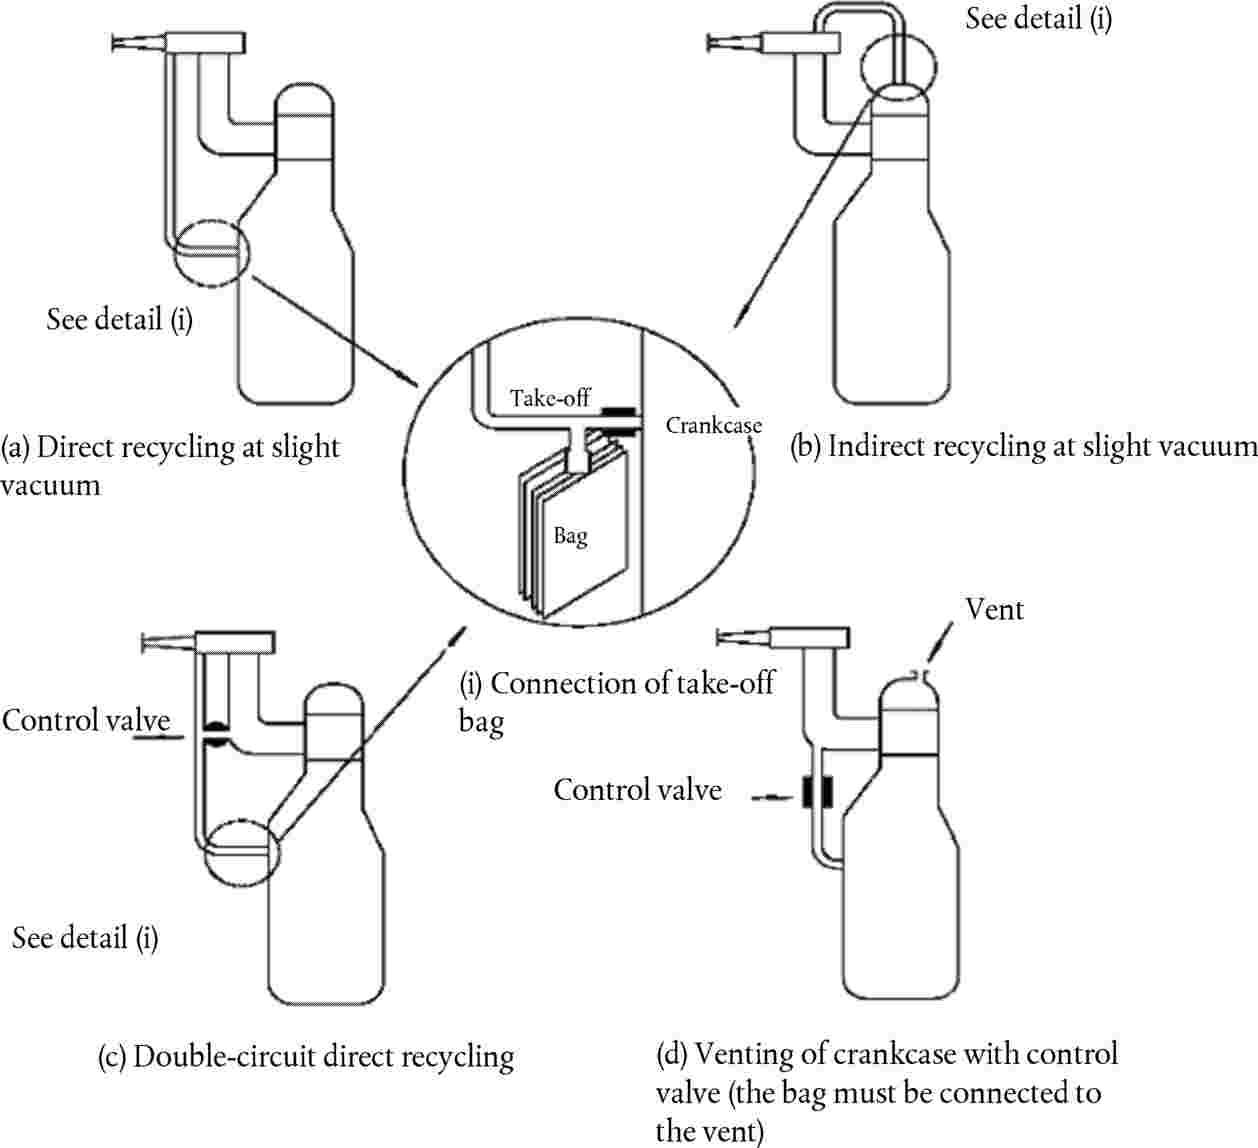 Eur Lex 42015x070301 En Plumbing Diagram Below Showing The Utilisation Of An Enginedriven